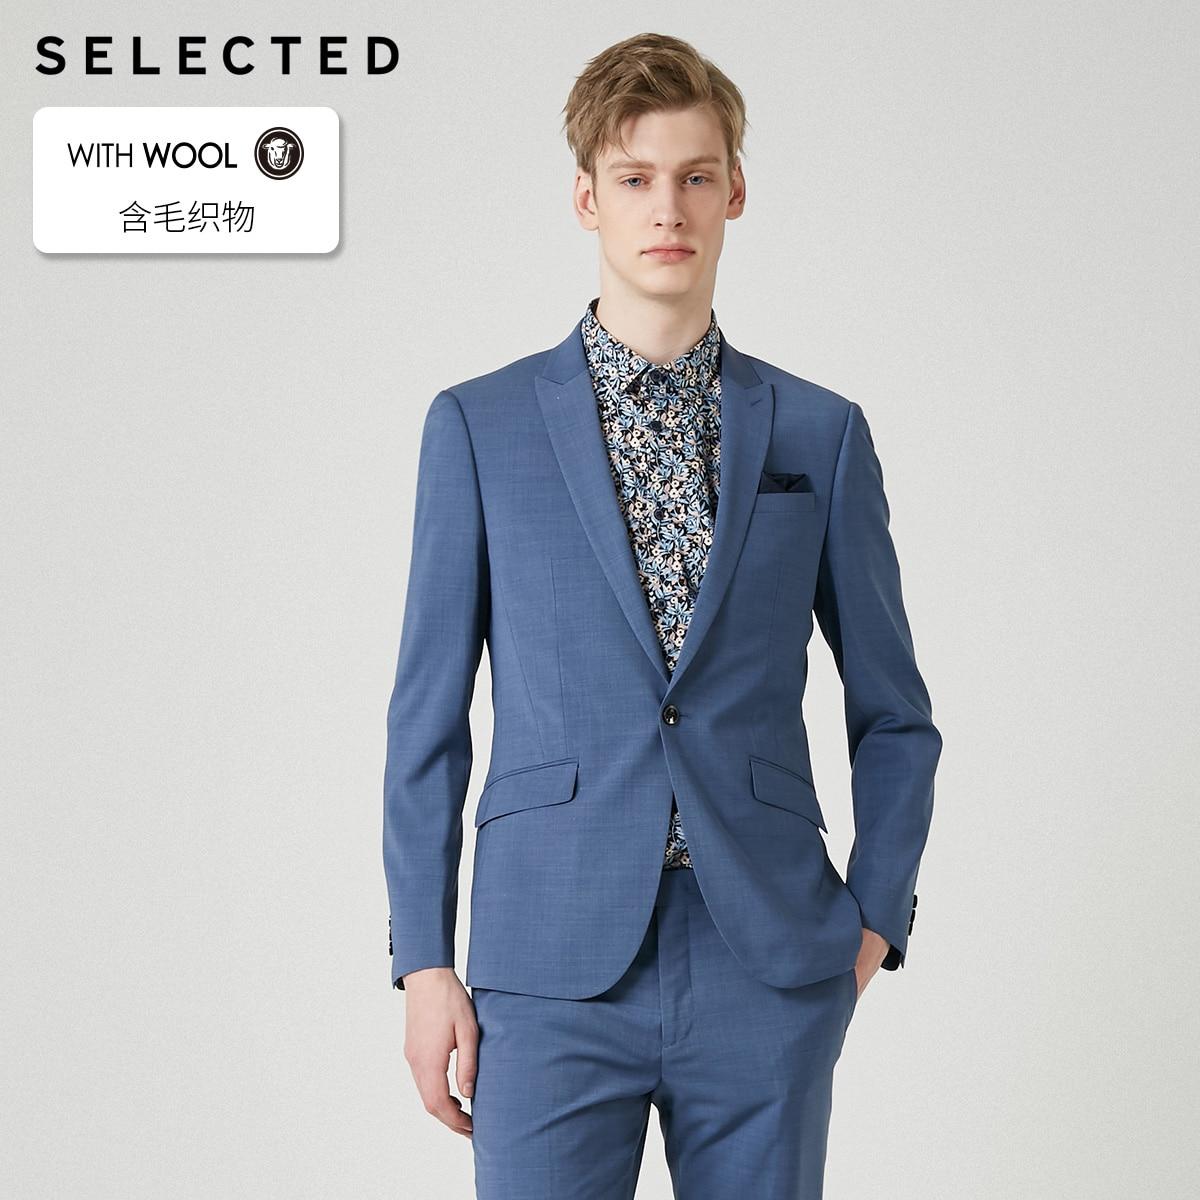 SELECTED Men's Slim-Fit Woolen Blazer Pure Color Closure Collar Jacket Clothes T | 41925Y503